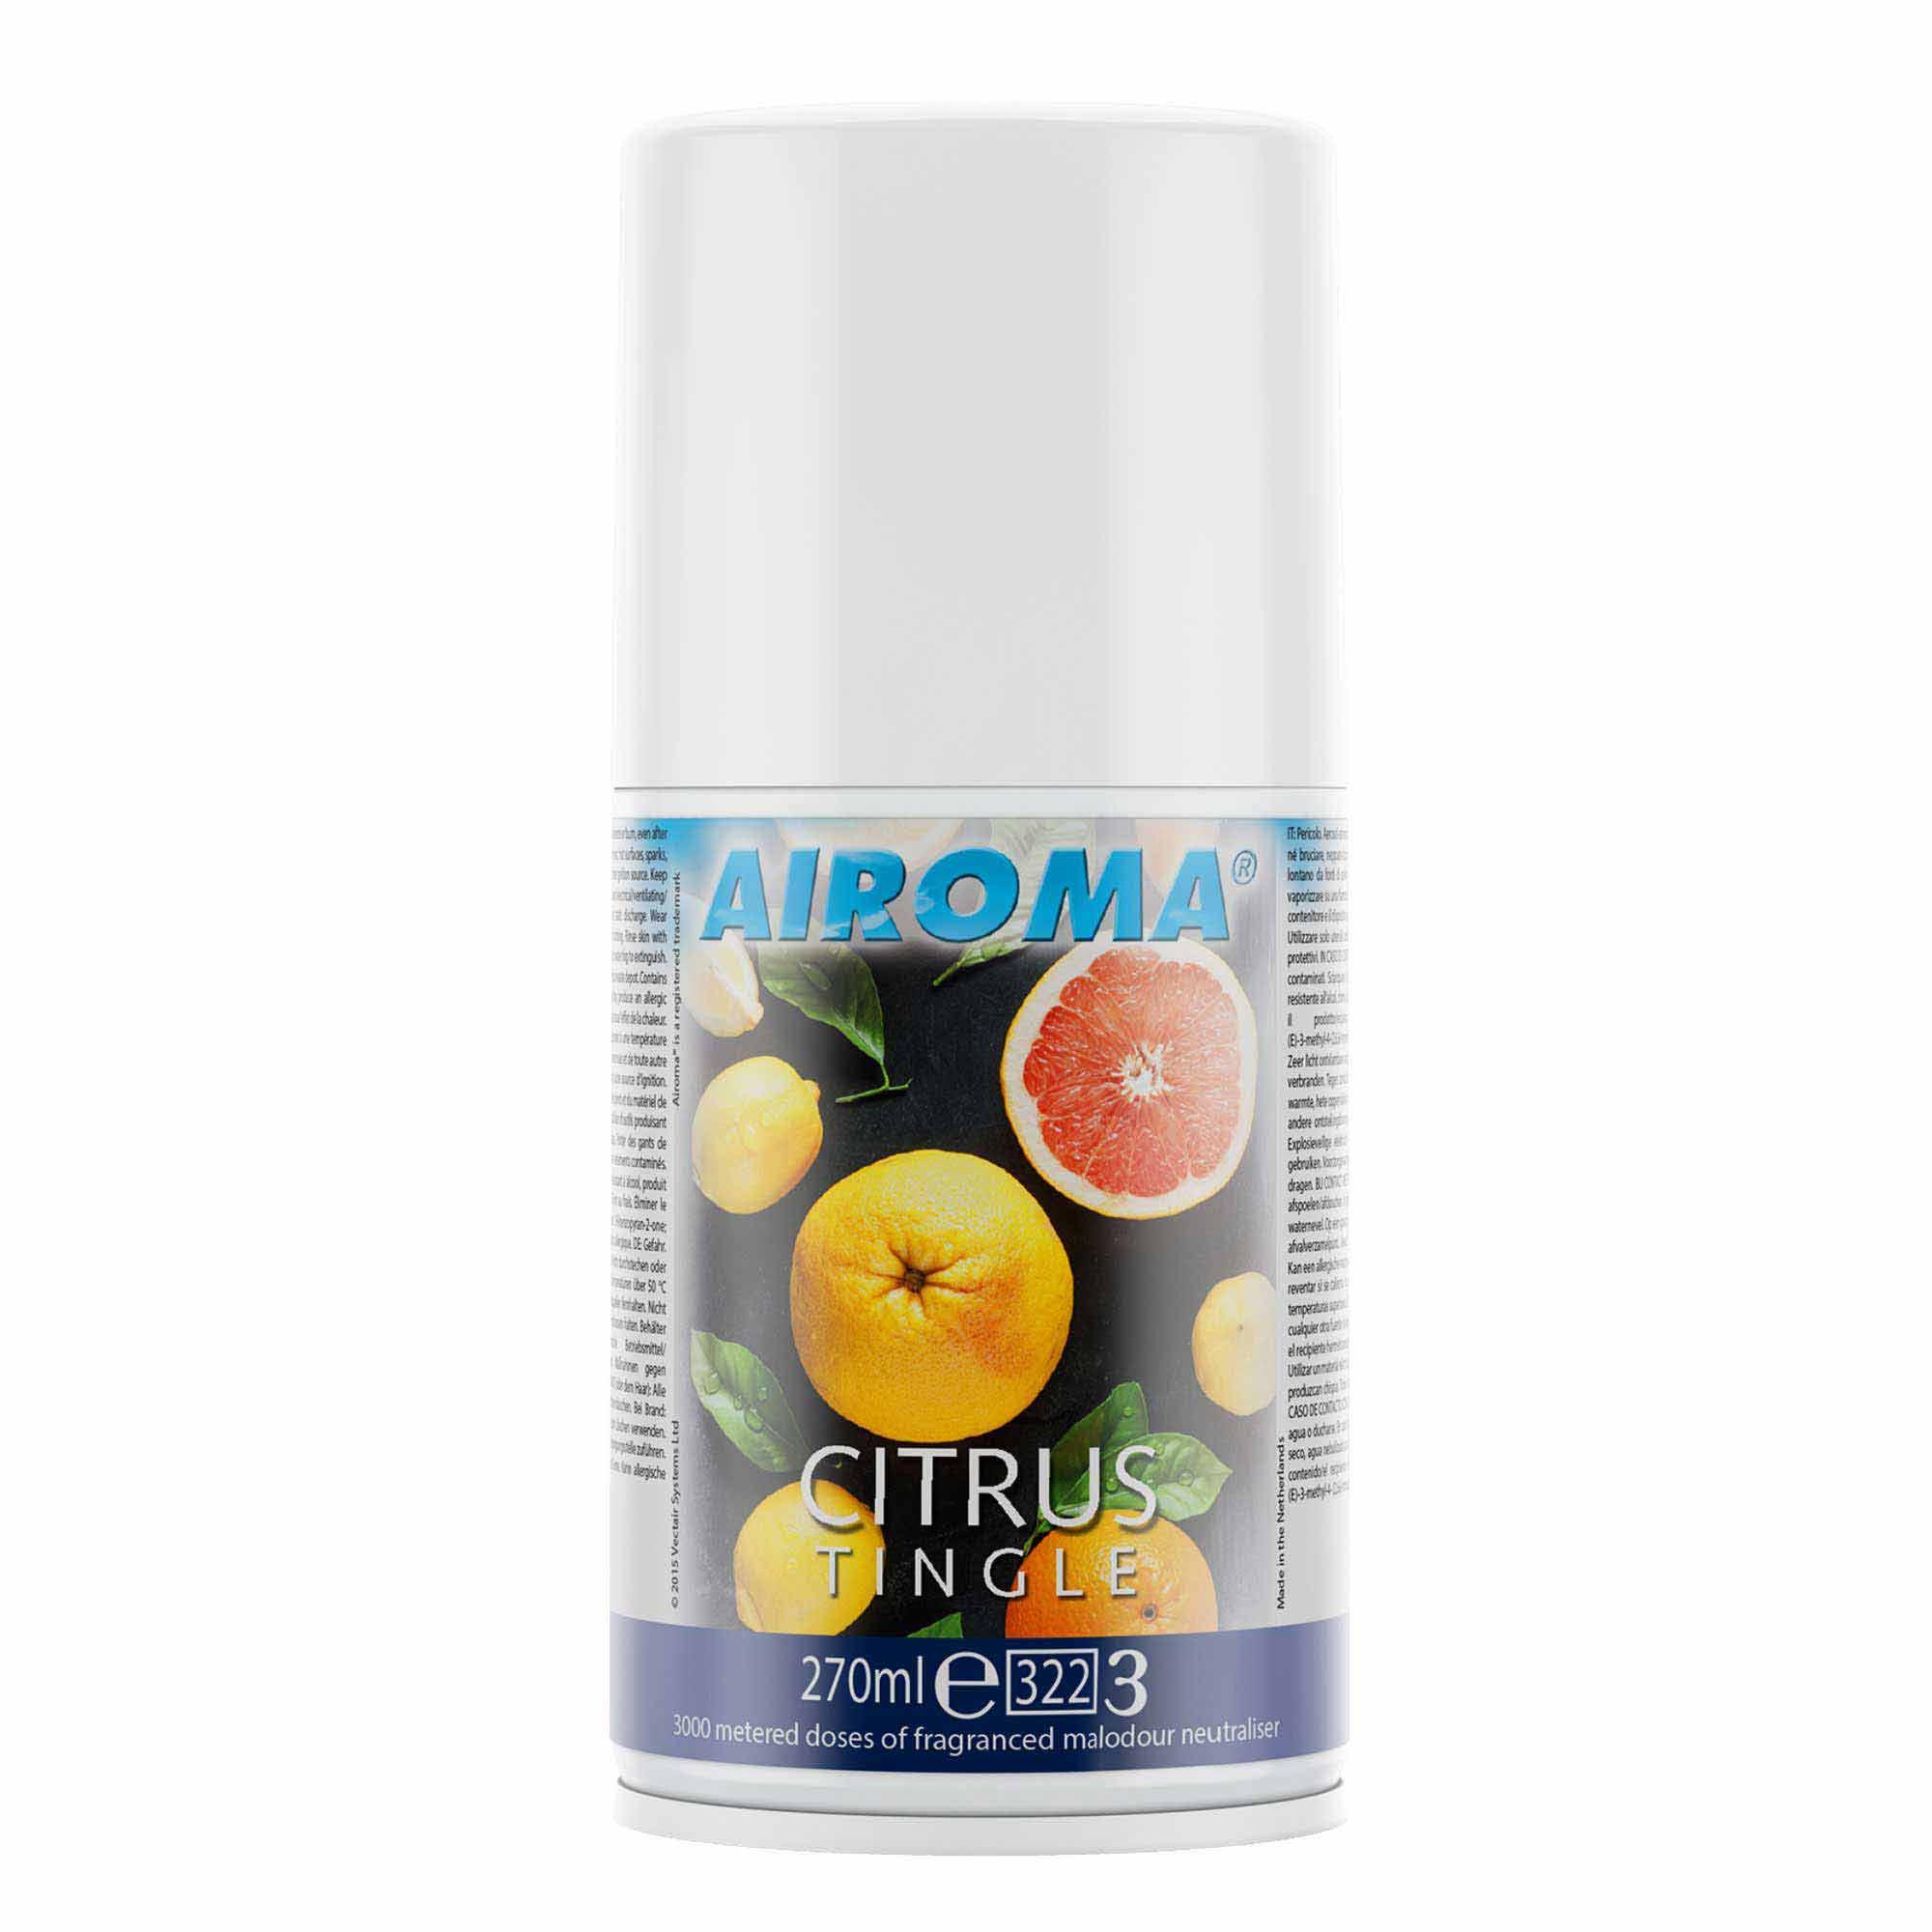 Airoma® Citrus Tingle Refill